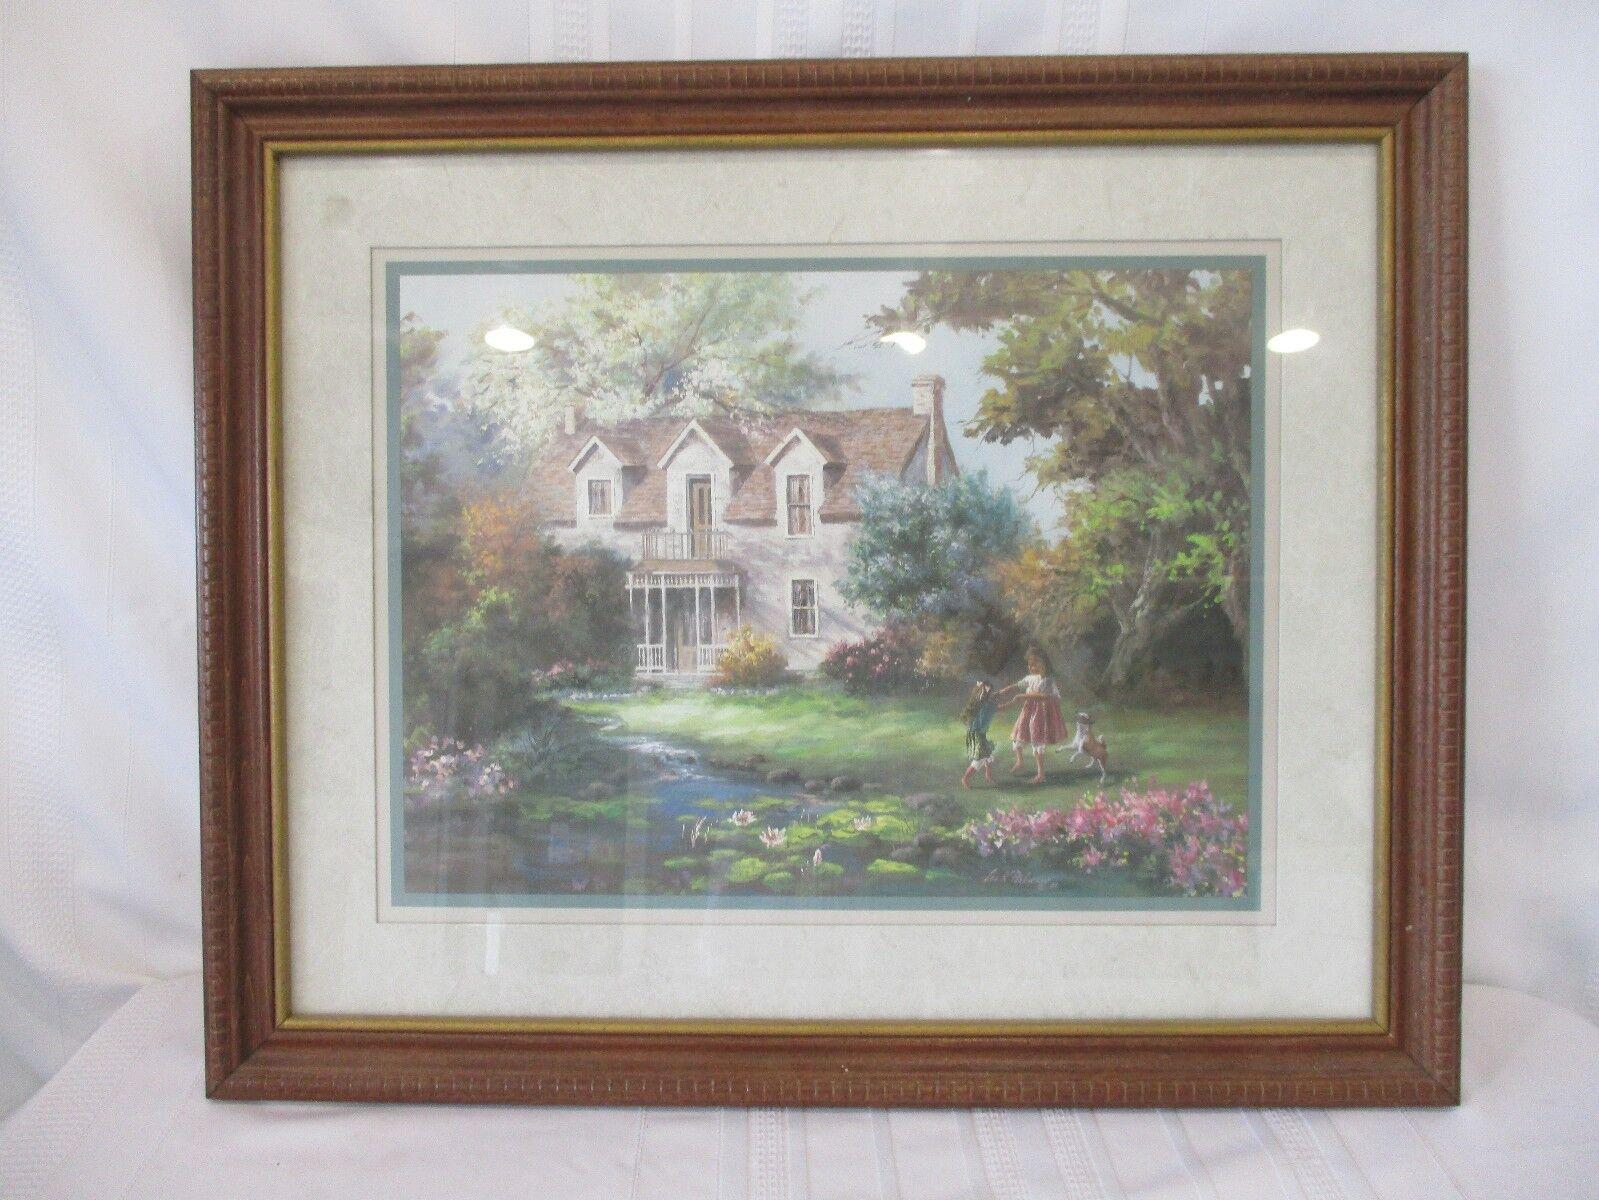 "Framed Lee K Parkinson Print  ""Country Living"" - 22 1/2"" x 18 1/2"""